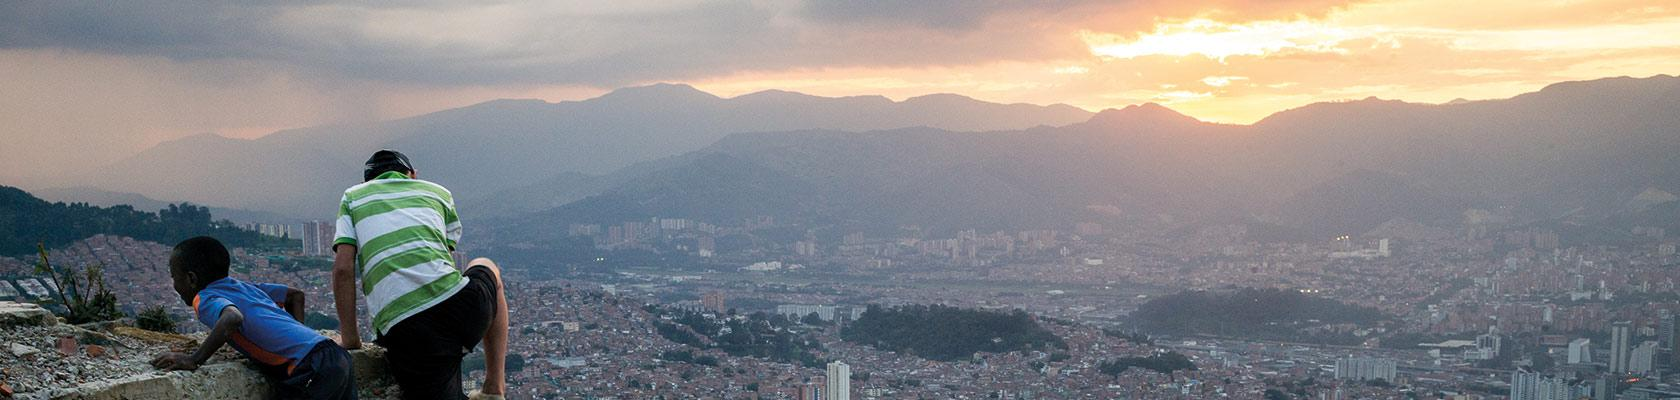 Latin America, view on Medellin, Colombia